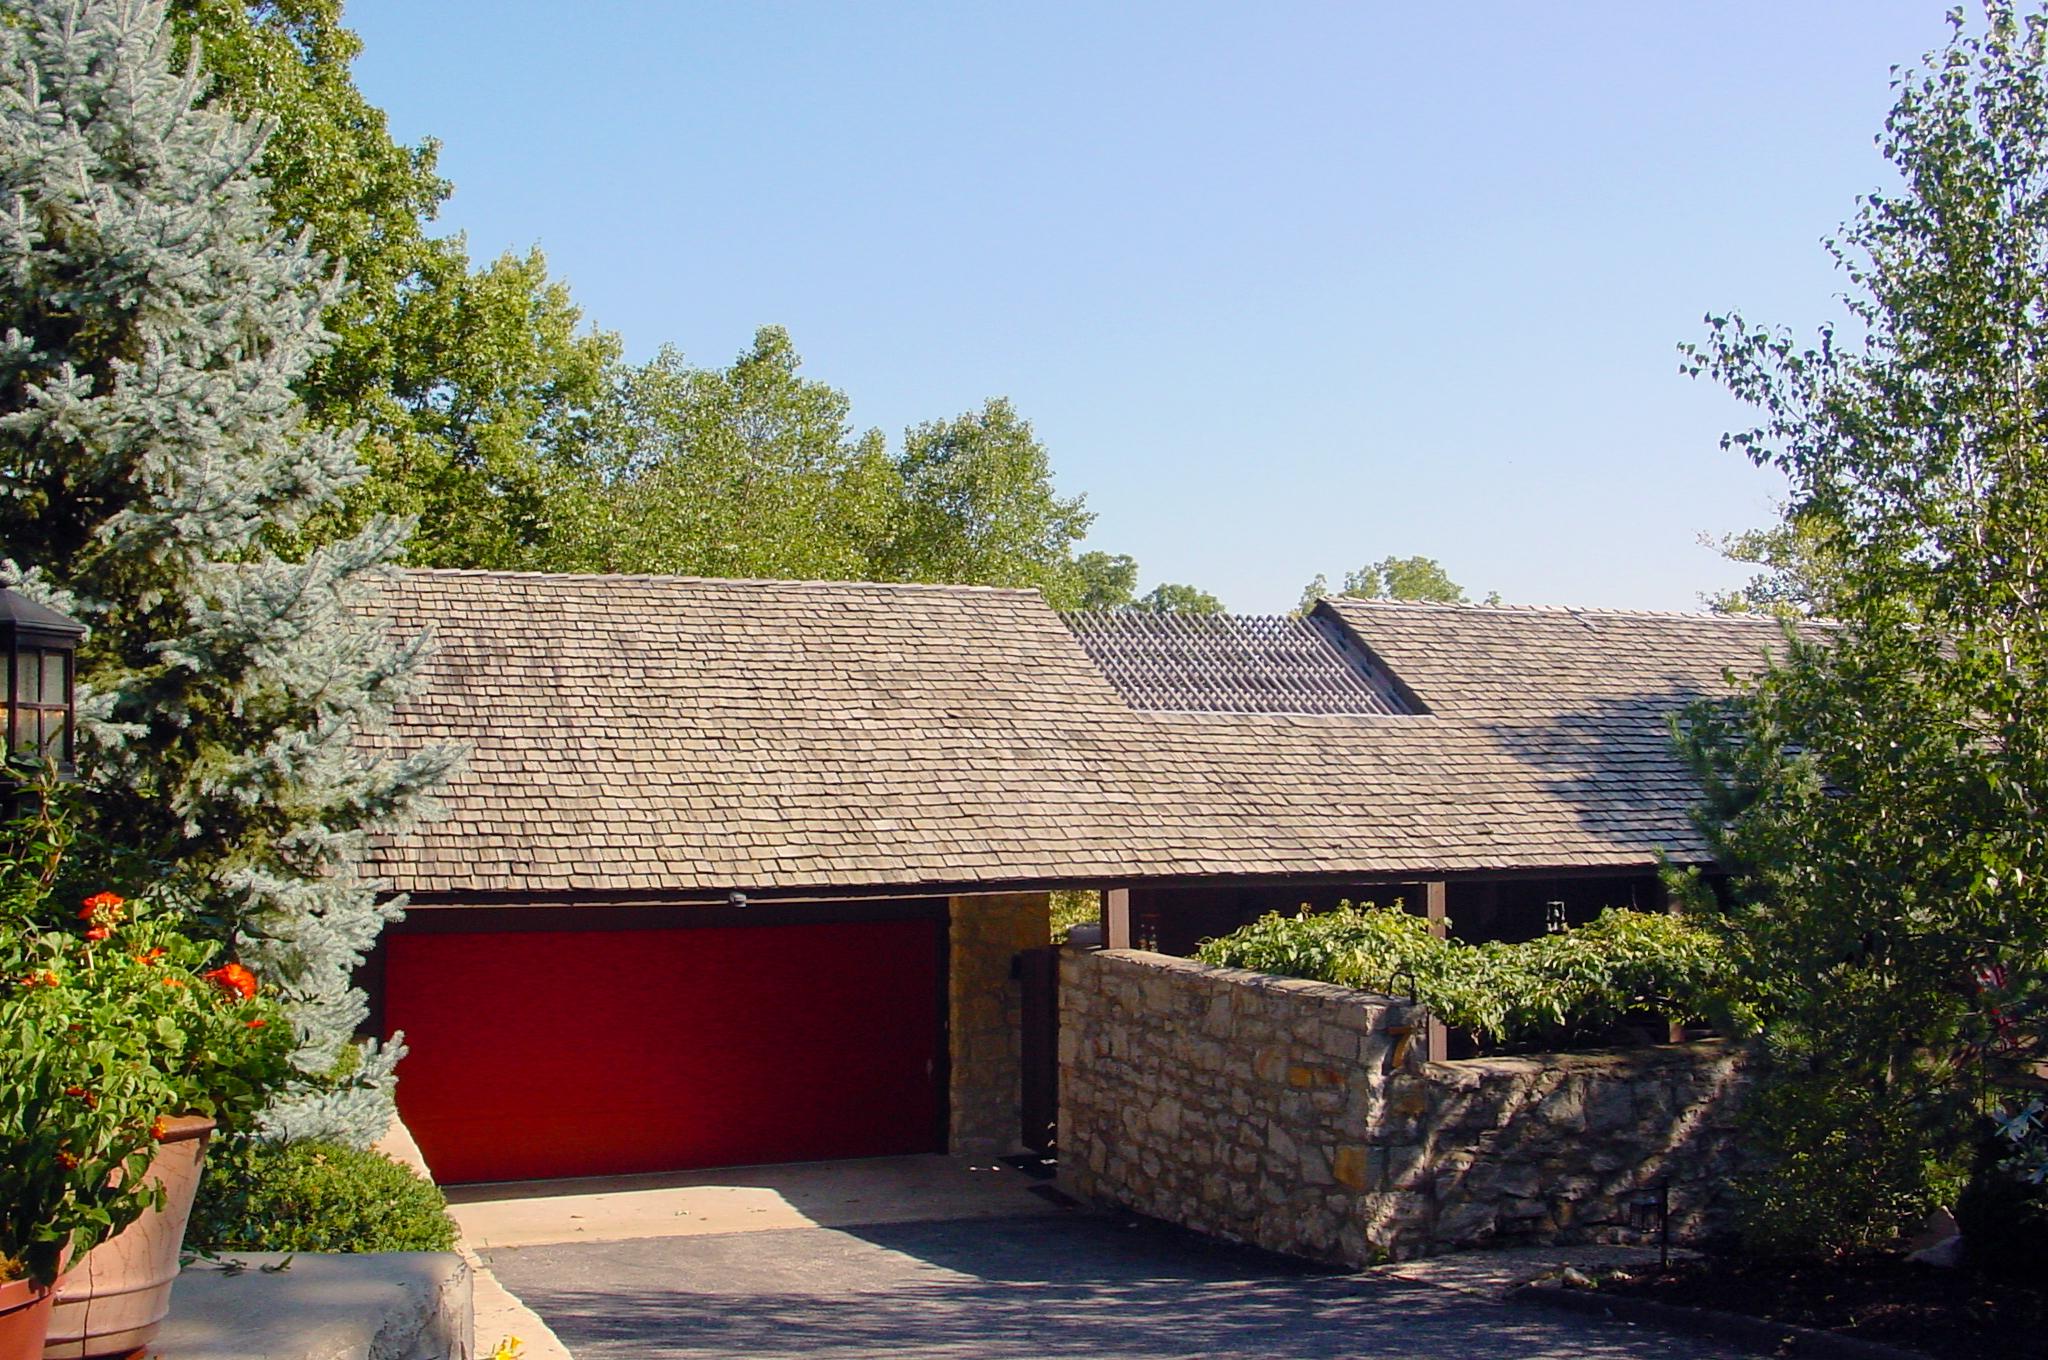 Residence - Architect, David. B. Runnells